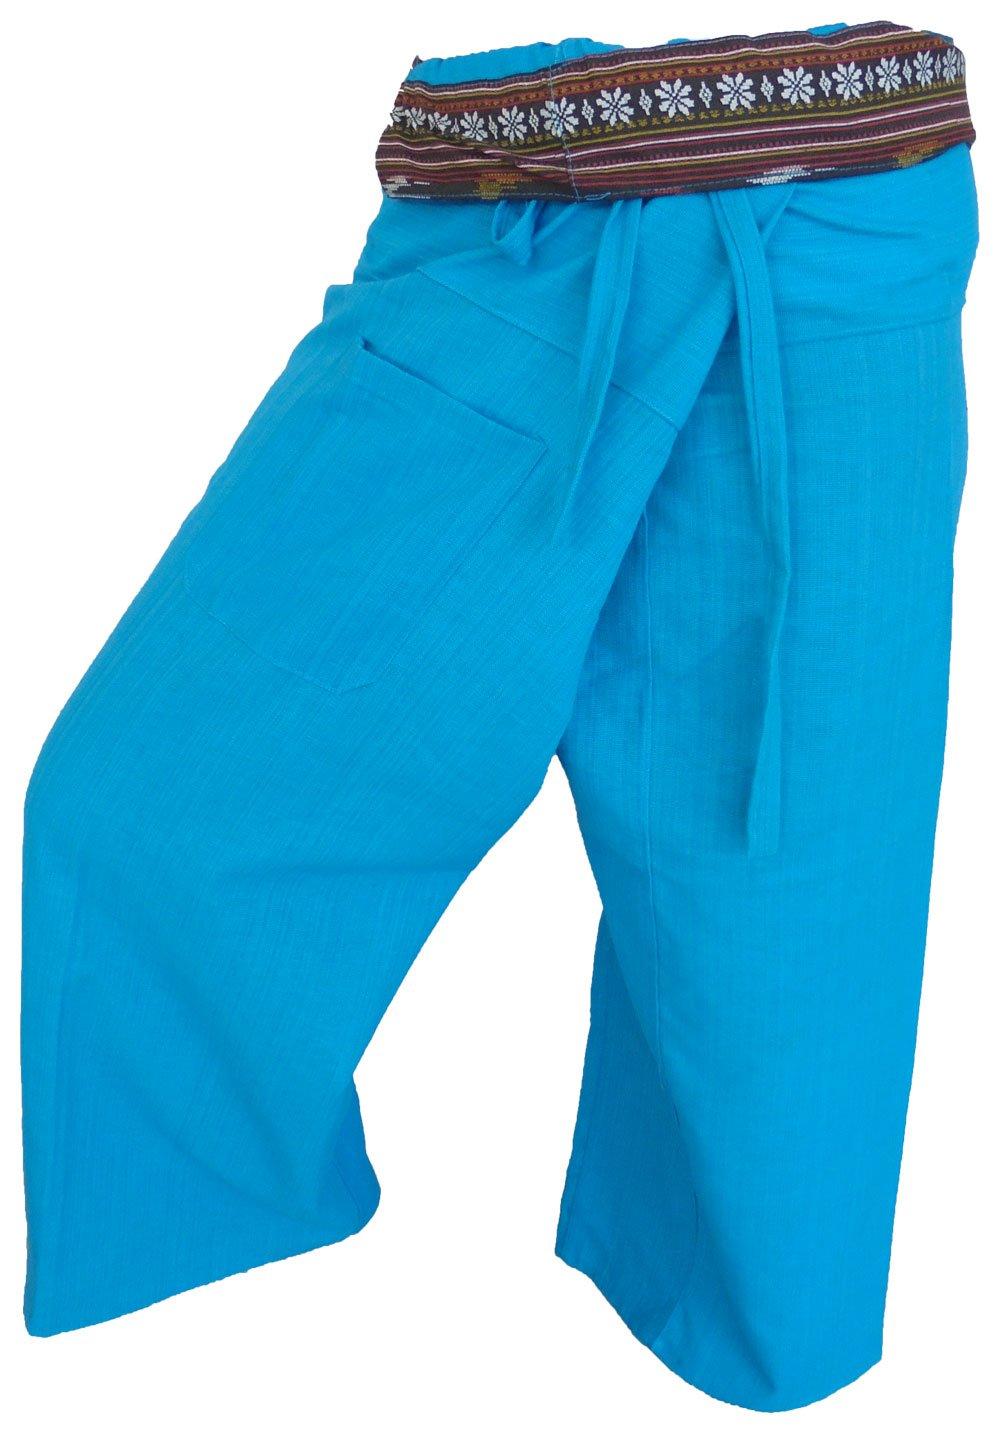 by soljo Fisherman Pantaloni Avvolgere Yoga Sport Fisherpant Cotone Thailandia Asia 16 Colori